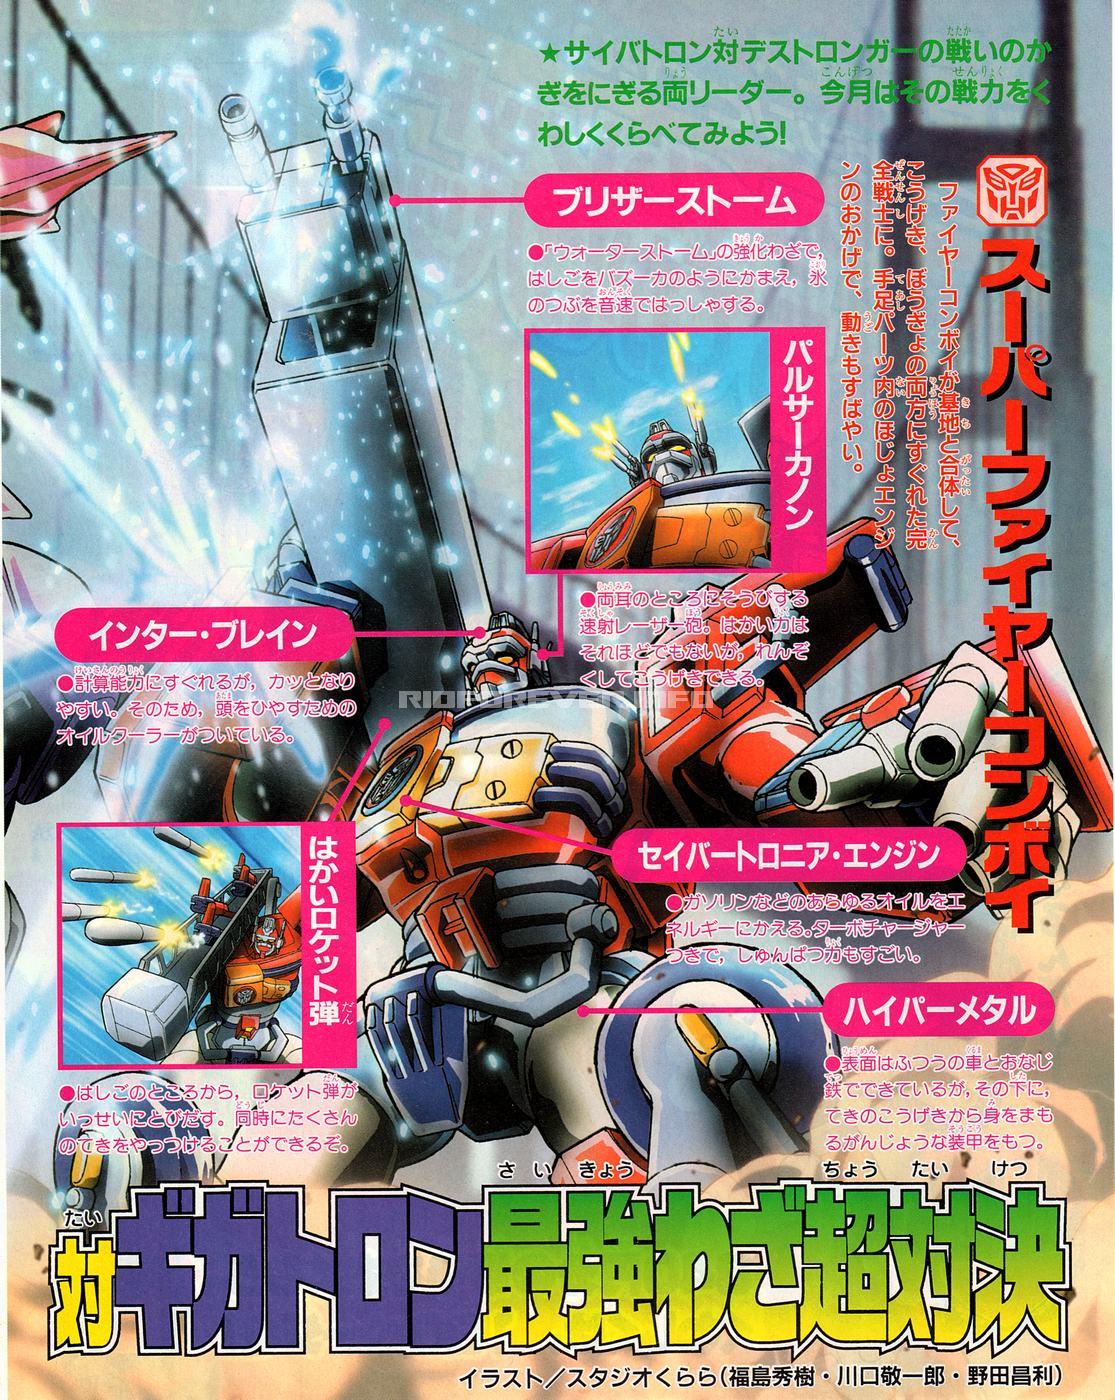 TV Magazine 2000-06-12-1